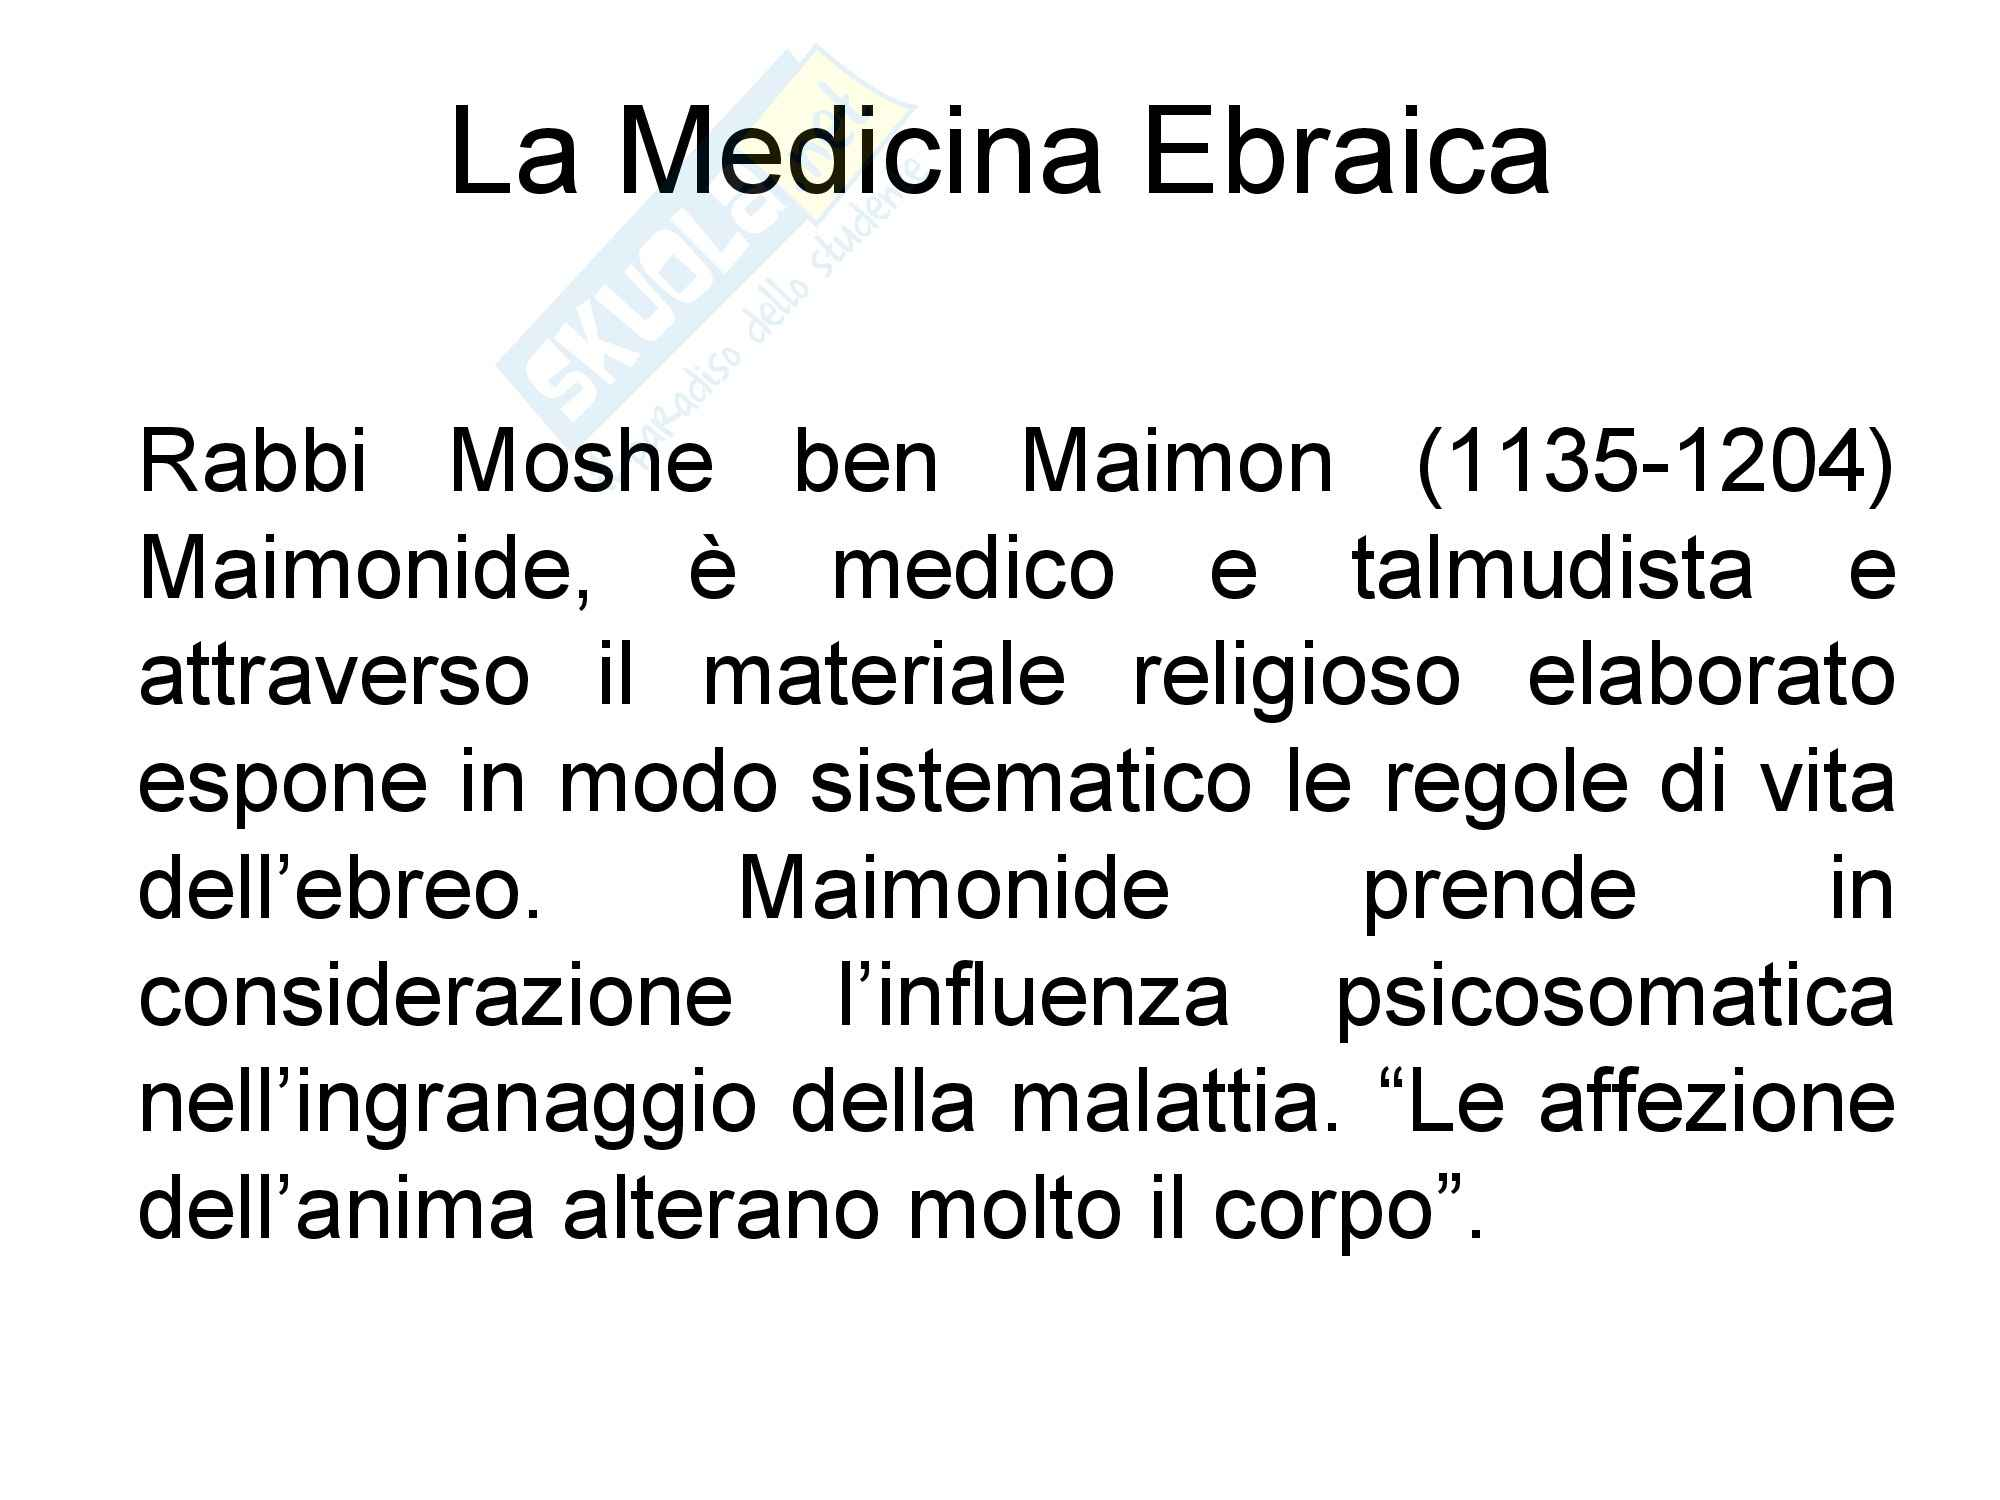 Storia della medicina - Da età classica a moderna Pag. 36